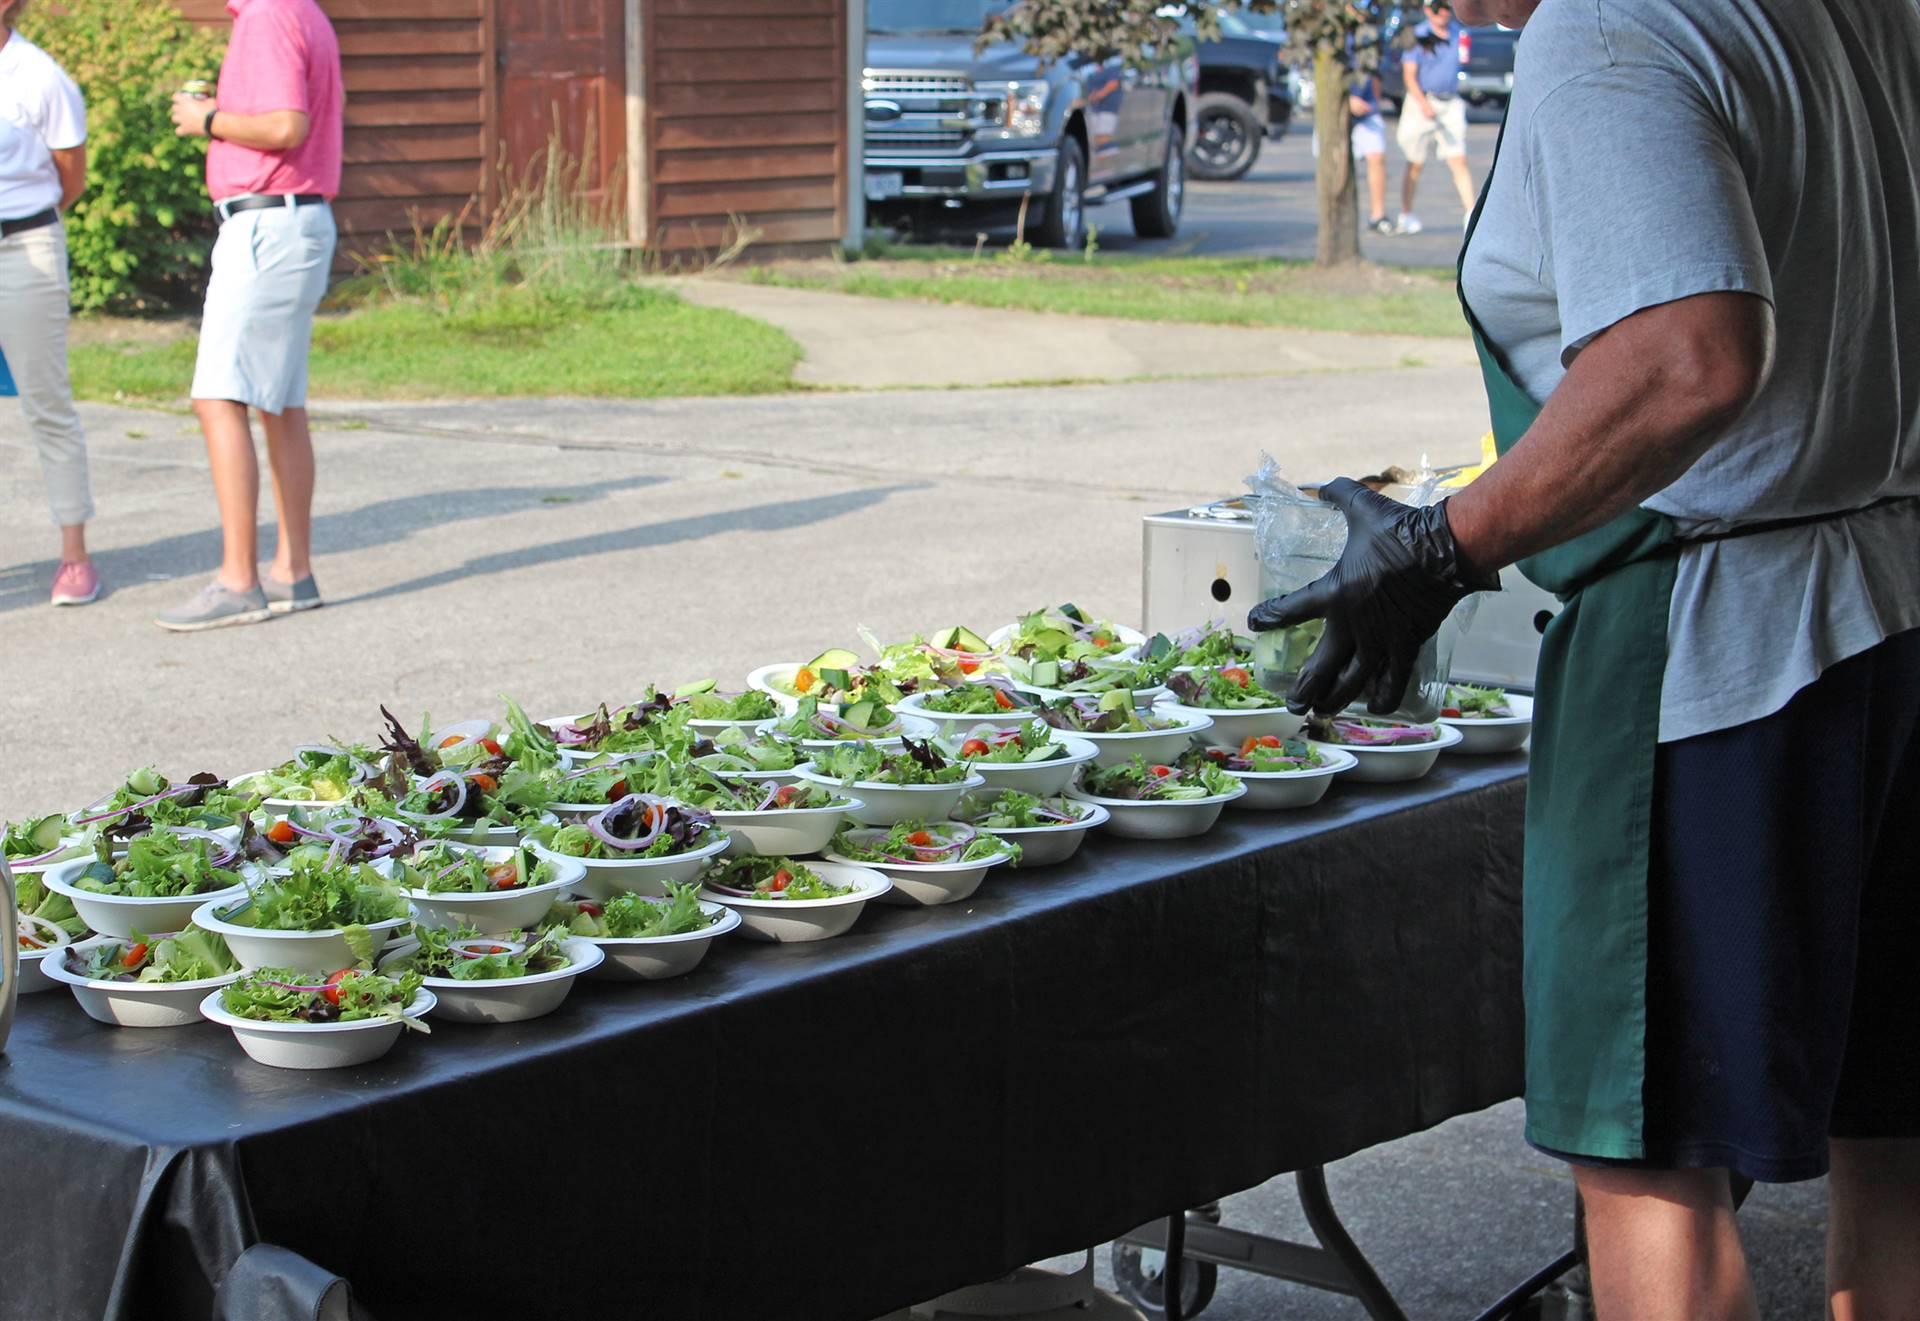 Sagehorn-Salads